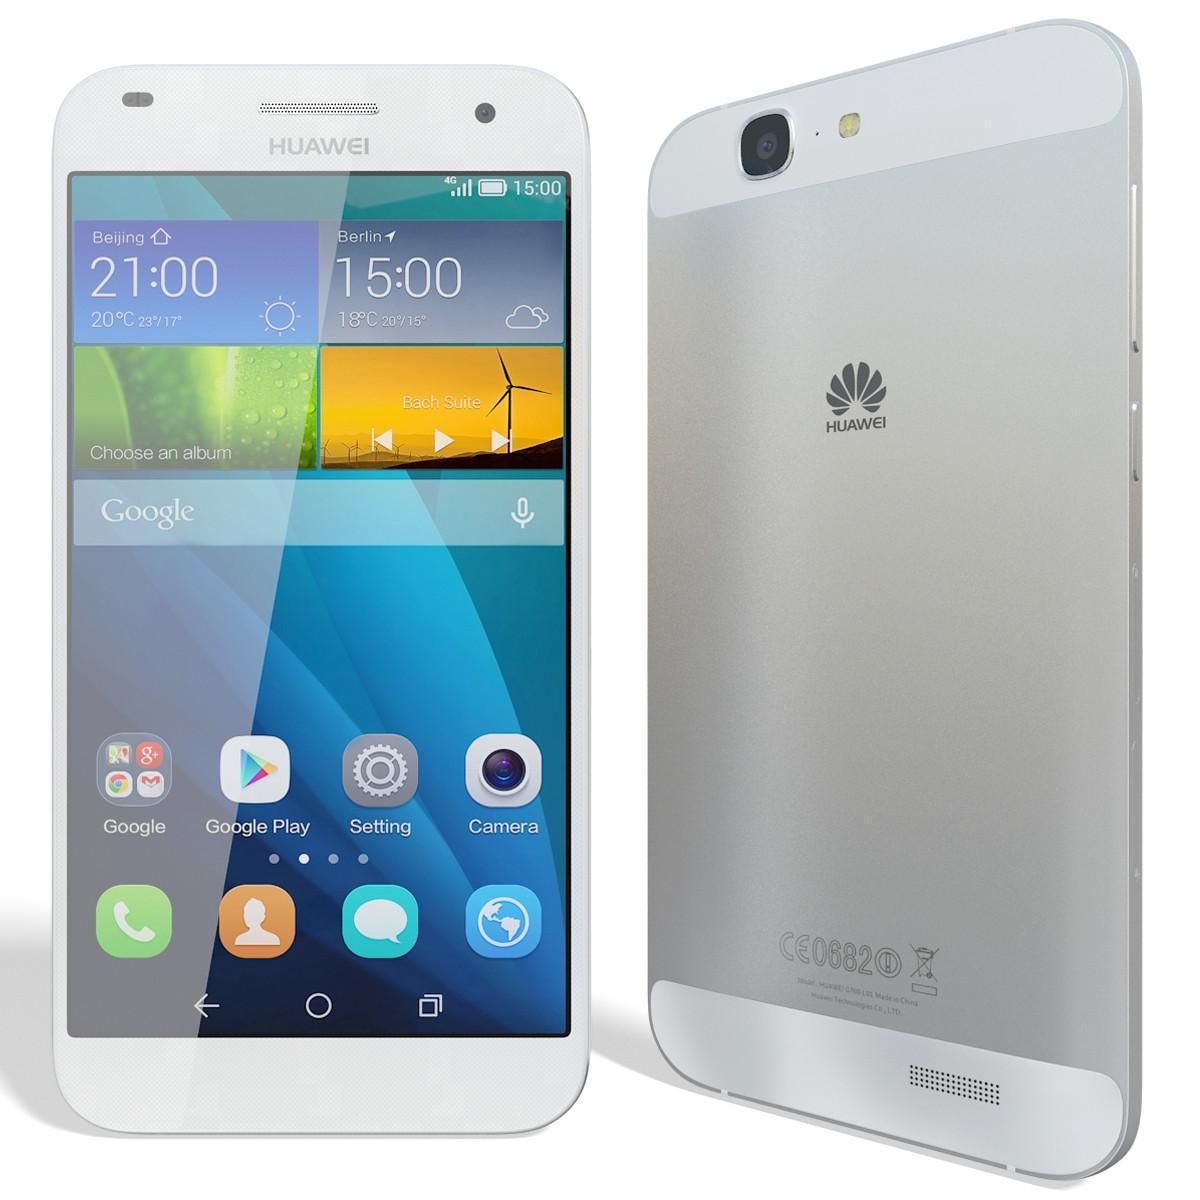 Huawei Ascend G7 16GB - 4G - Plata - Libre